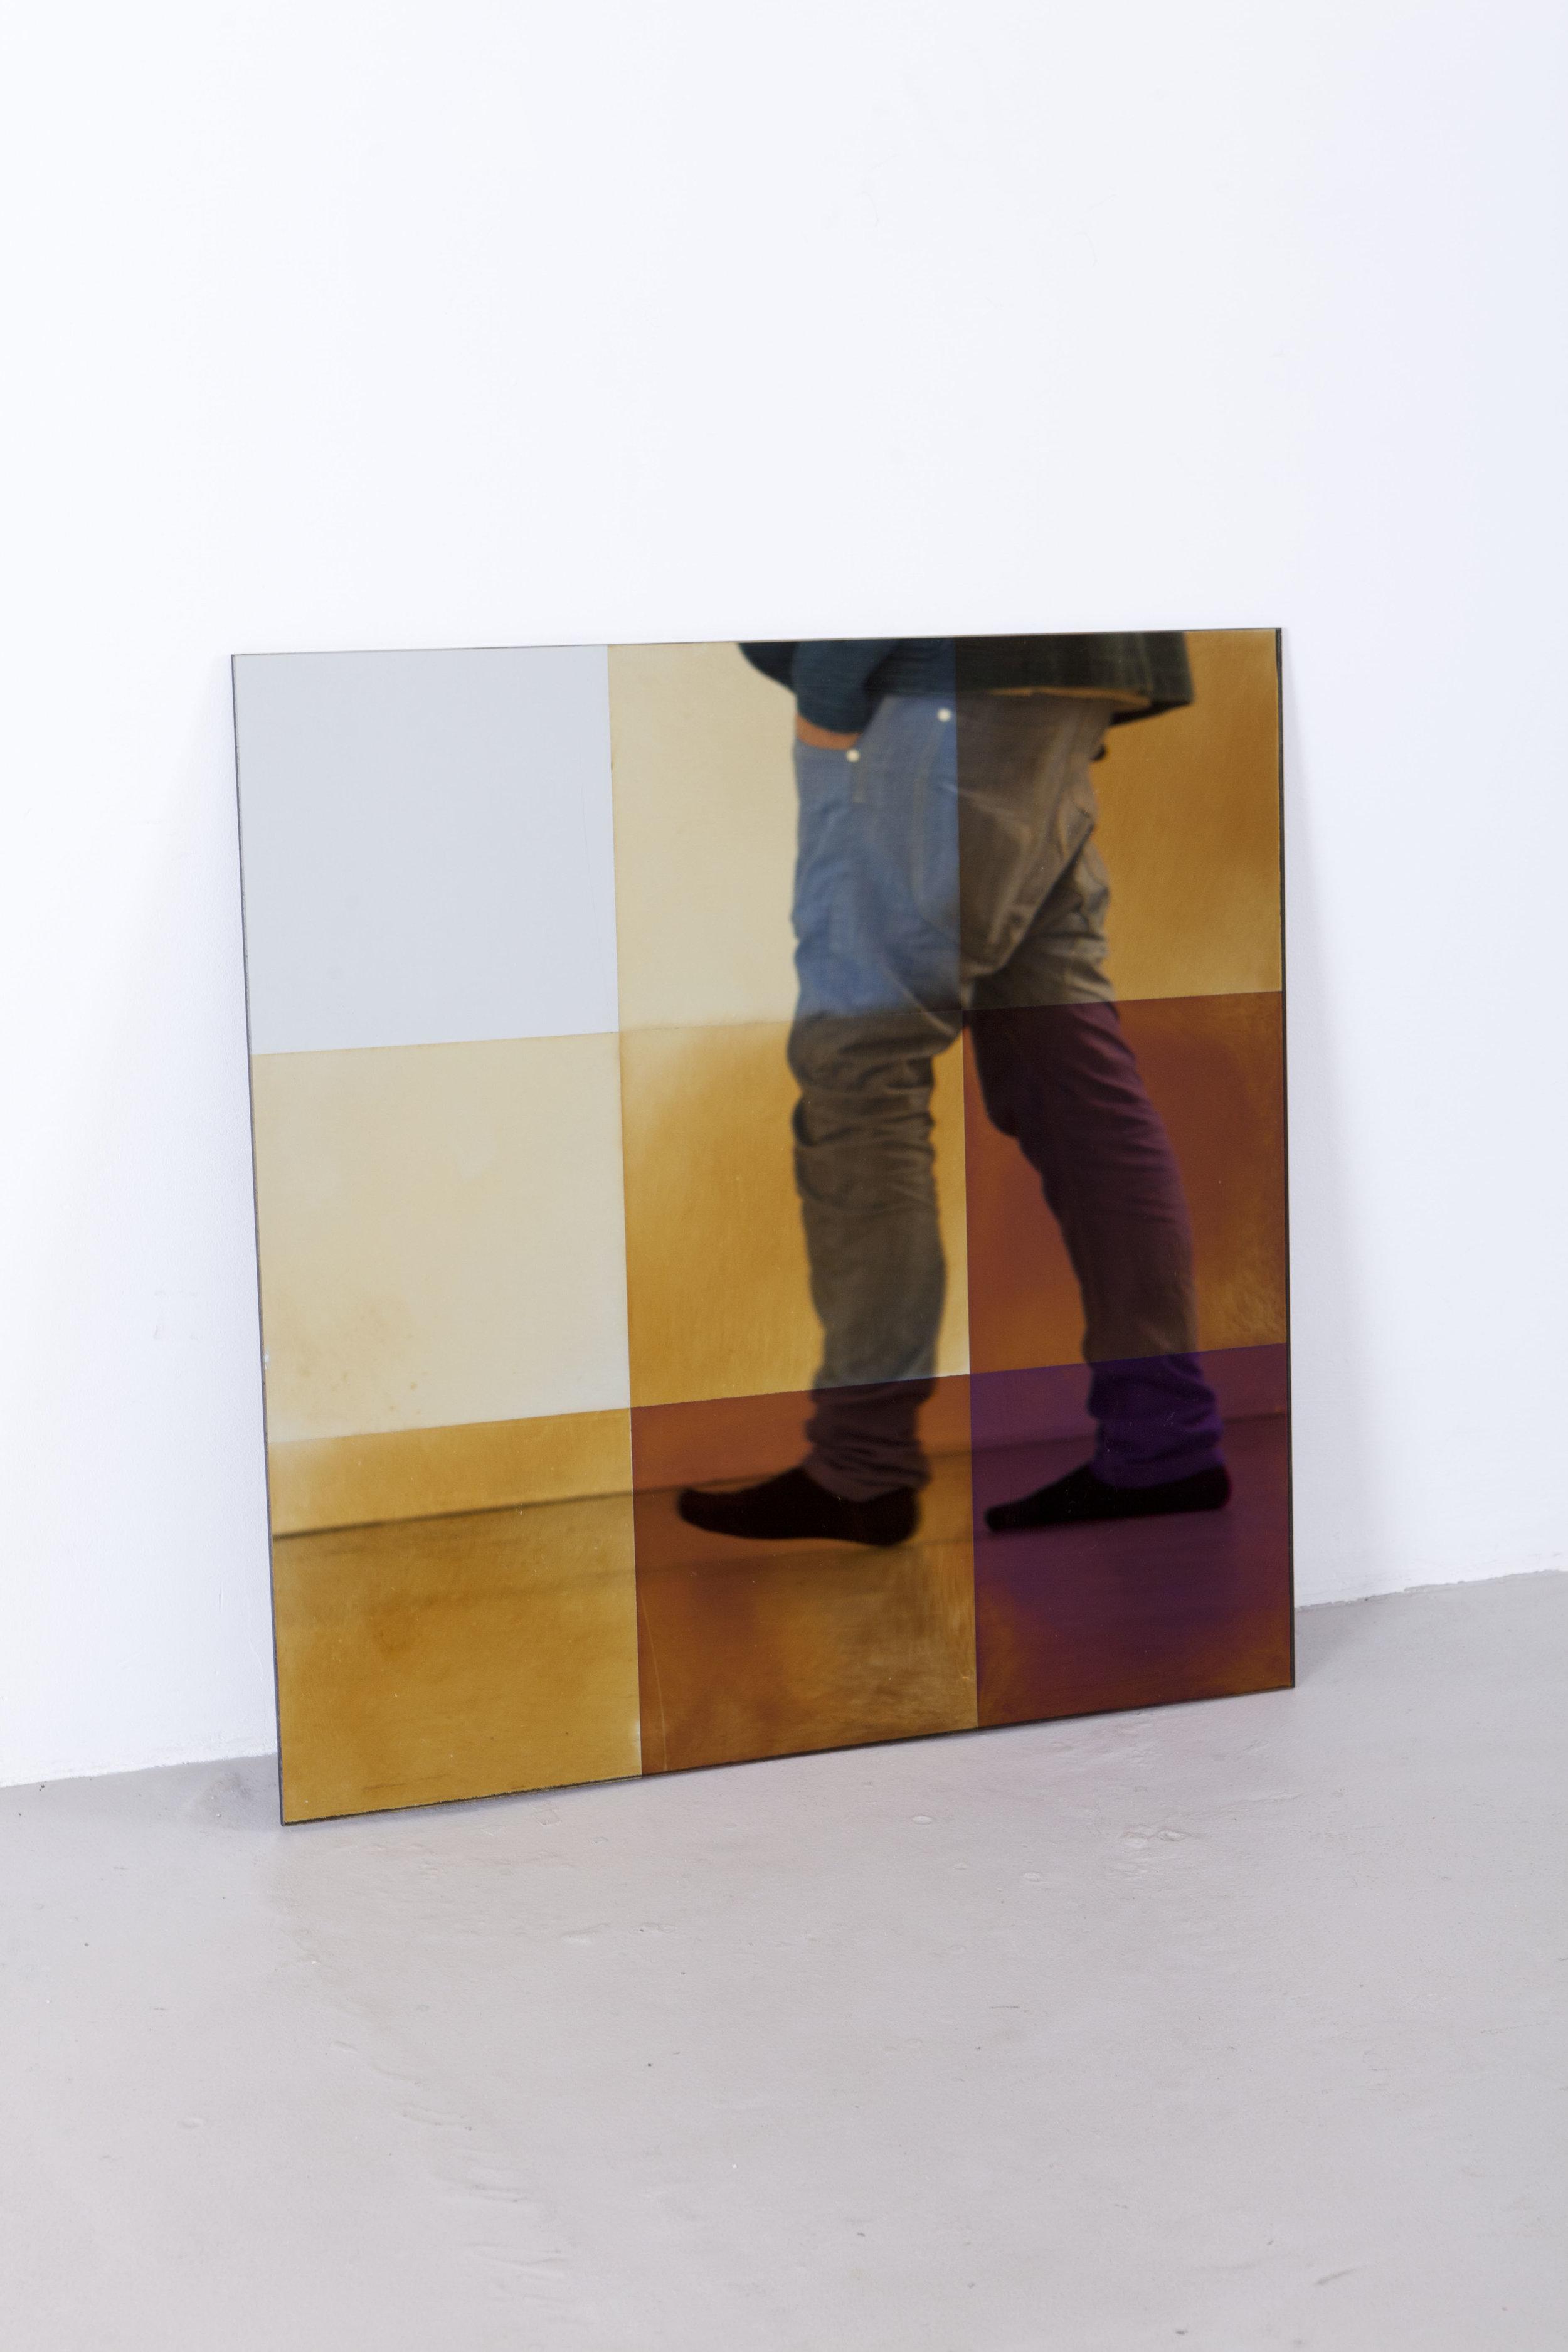 transnatural_Transience_mirror_square+feet_byfloorknaapen_27.jpg